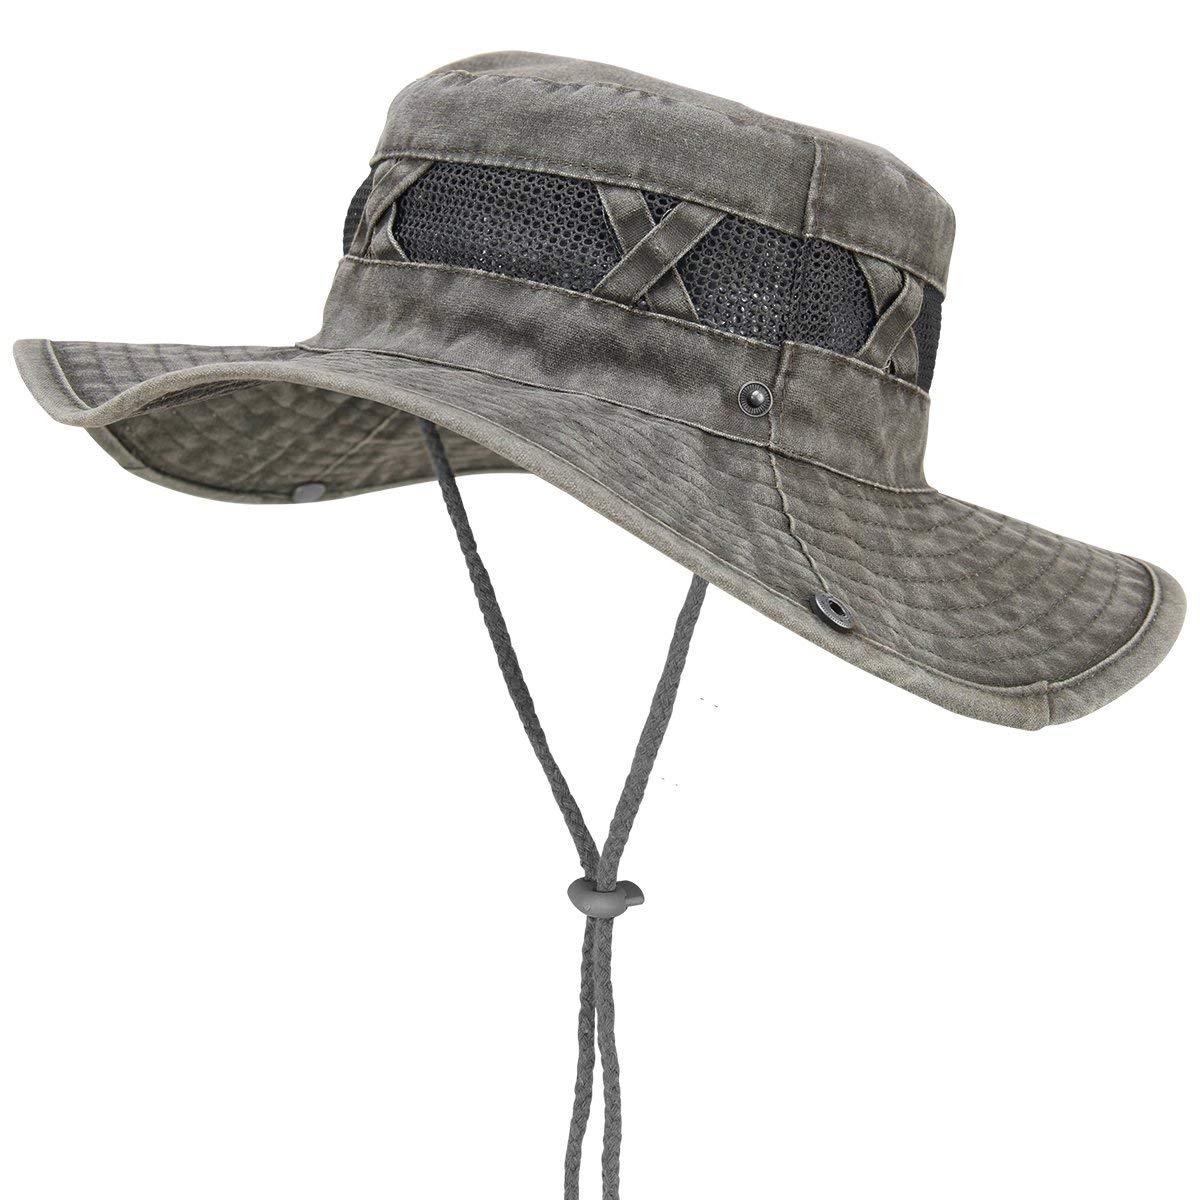 b1b768733704f Get Quotations · Bodvera Outdoor Sun Protection Wide Brim Boonie Hat Bucket  Safari Hunting Fishing Summer Cap